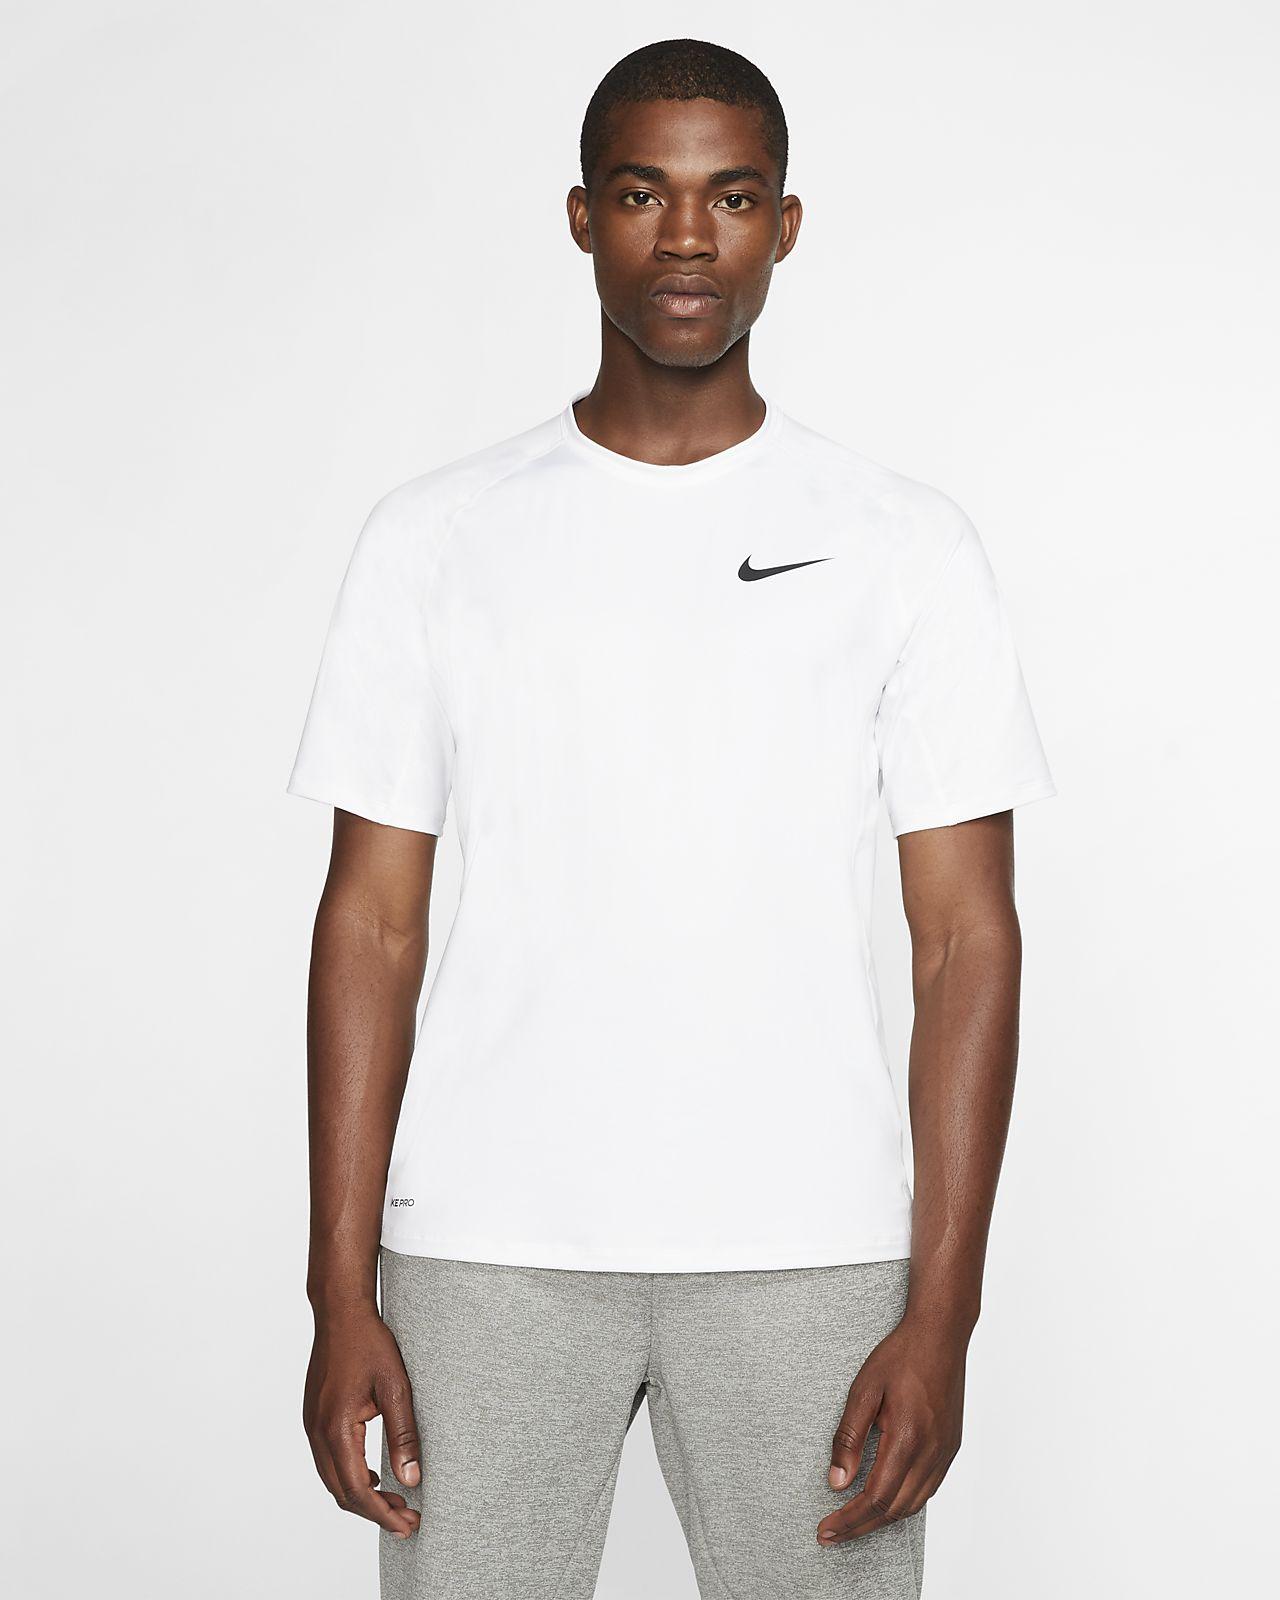 Nike Pro Men's Short Sleeve Top